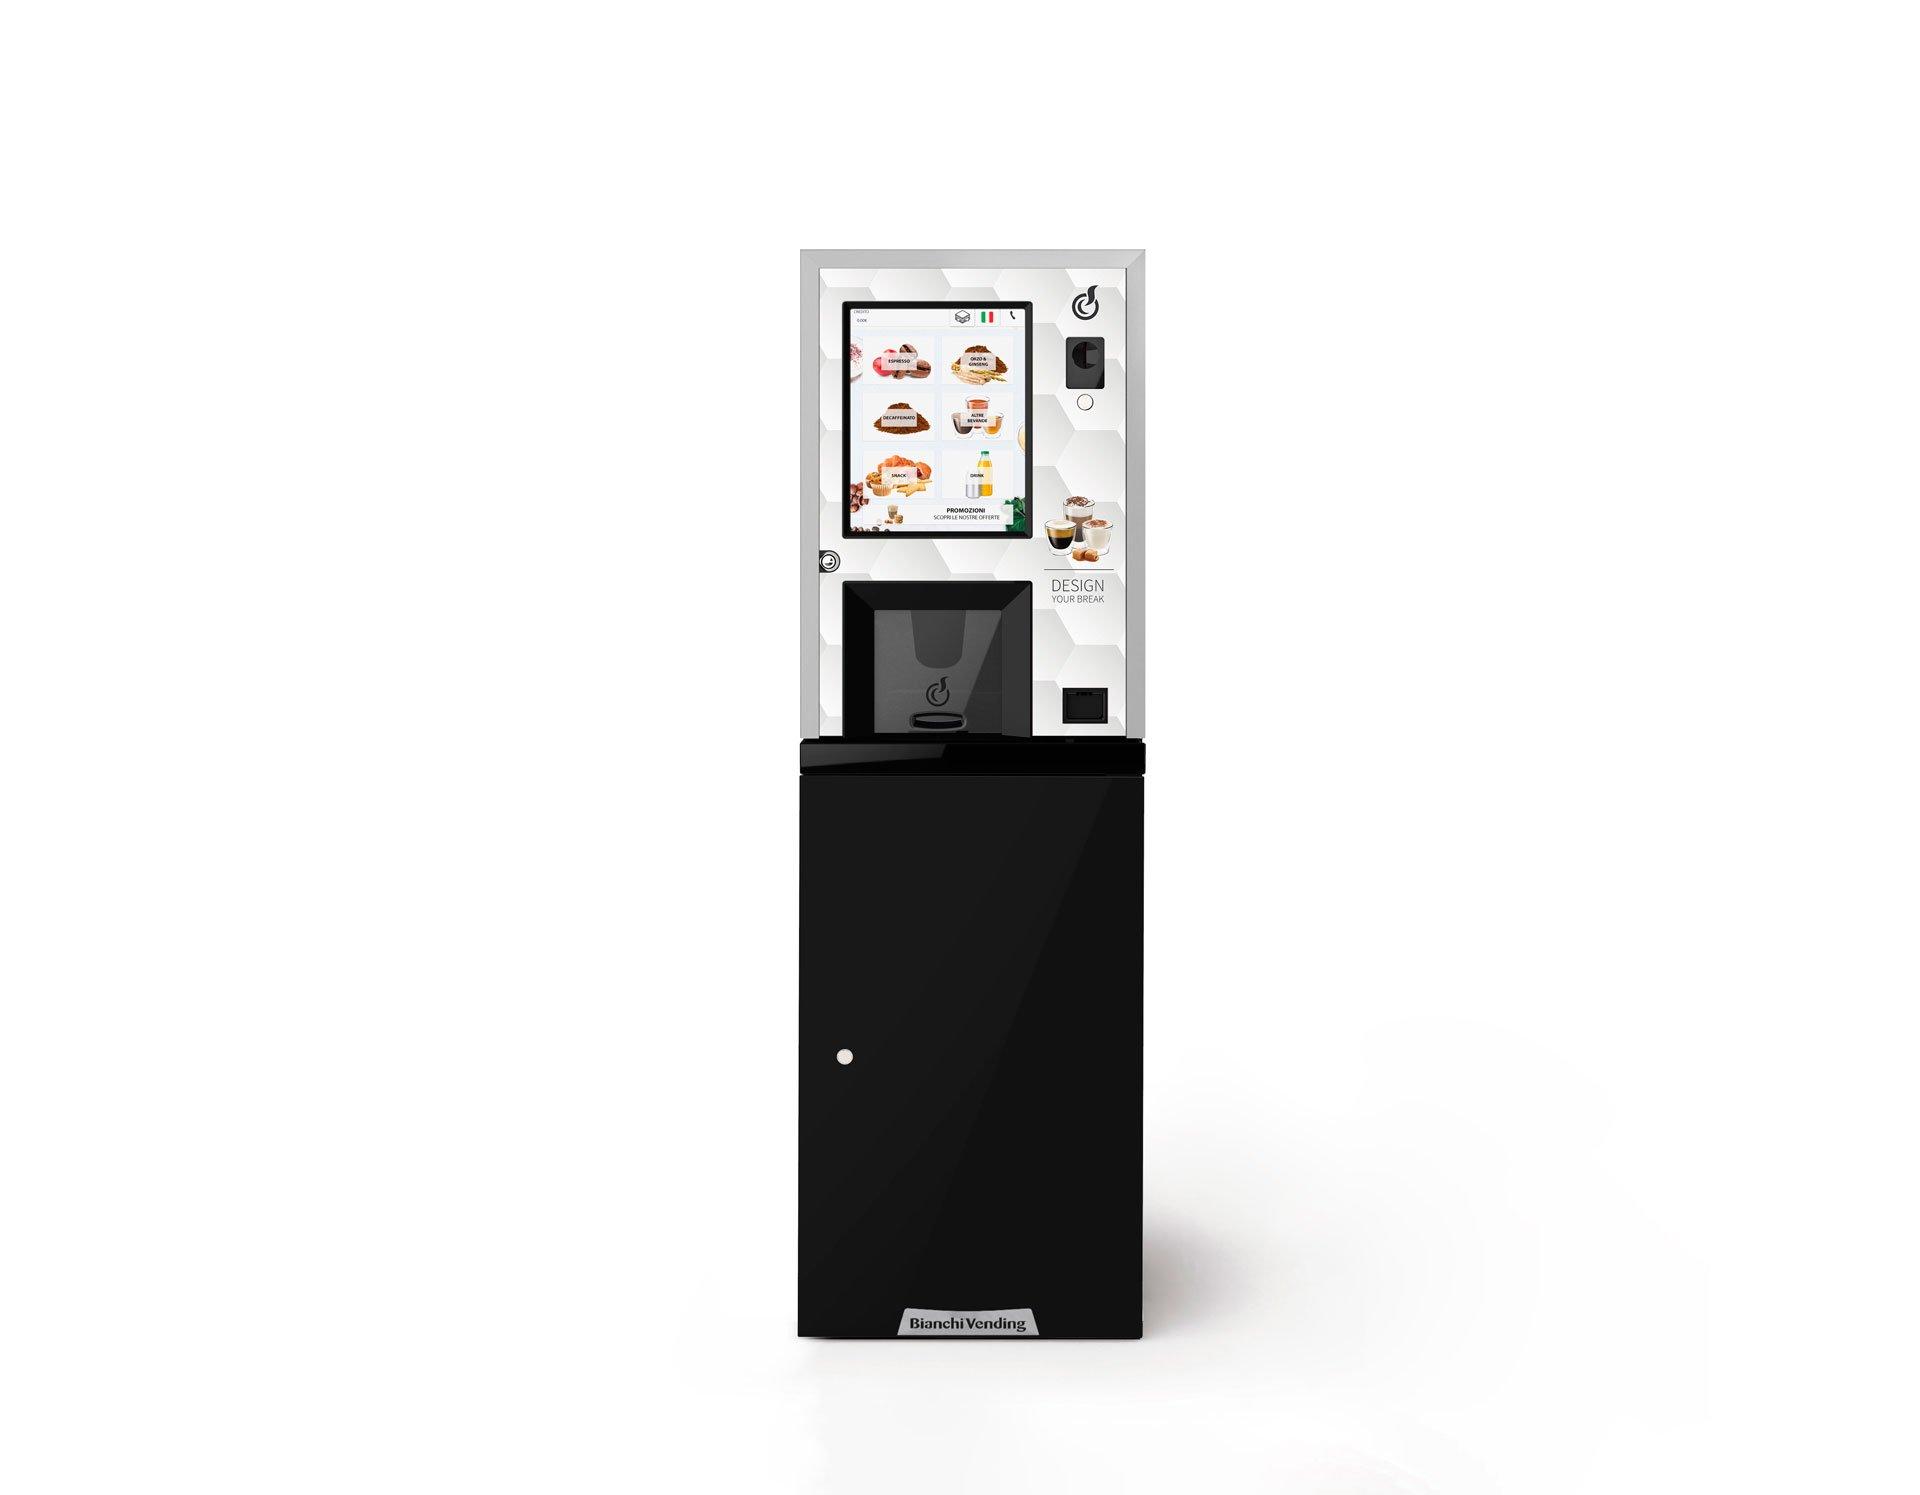 Lei-250-fronte-touch-mobiletto